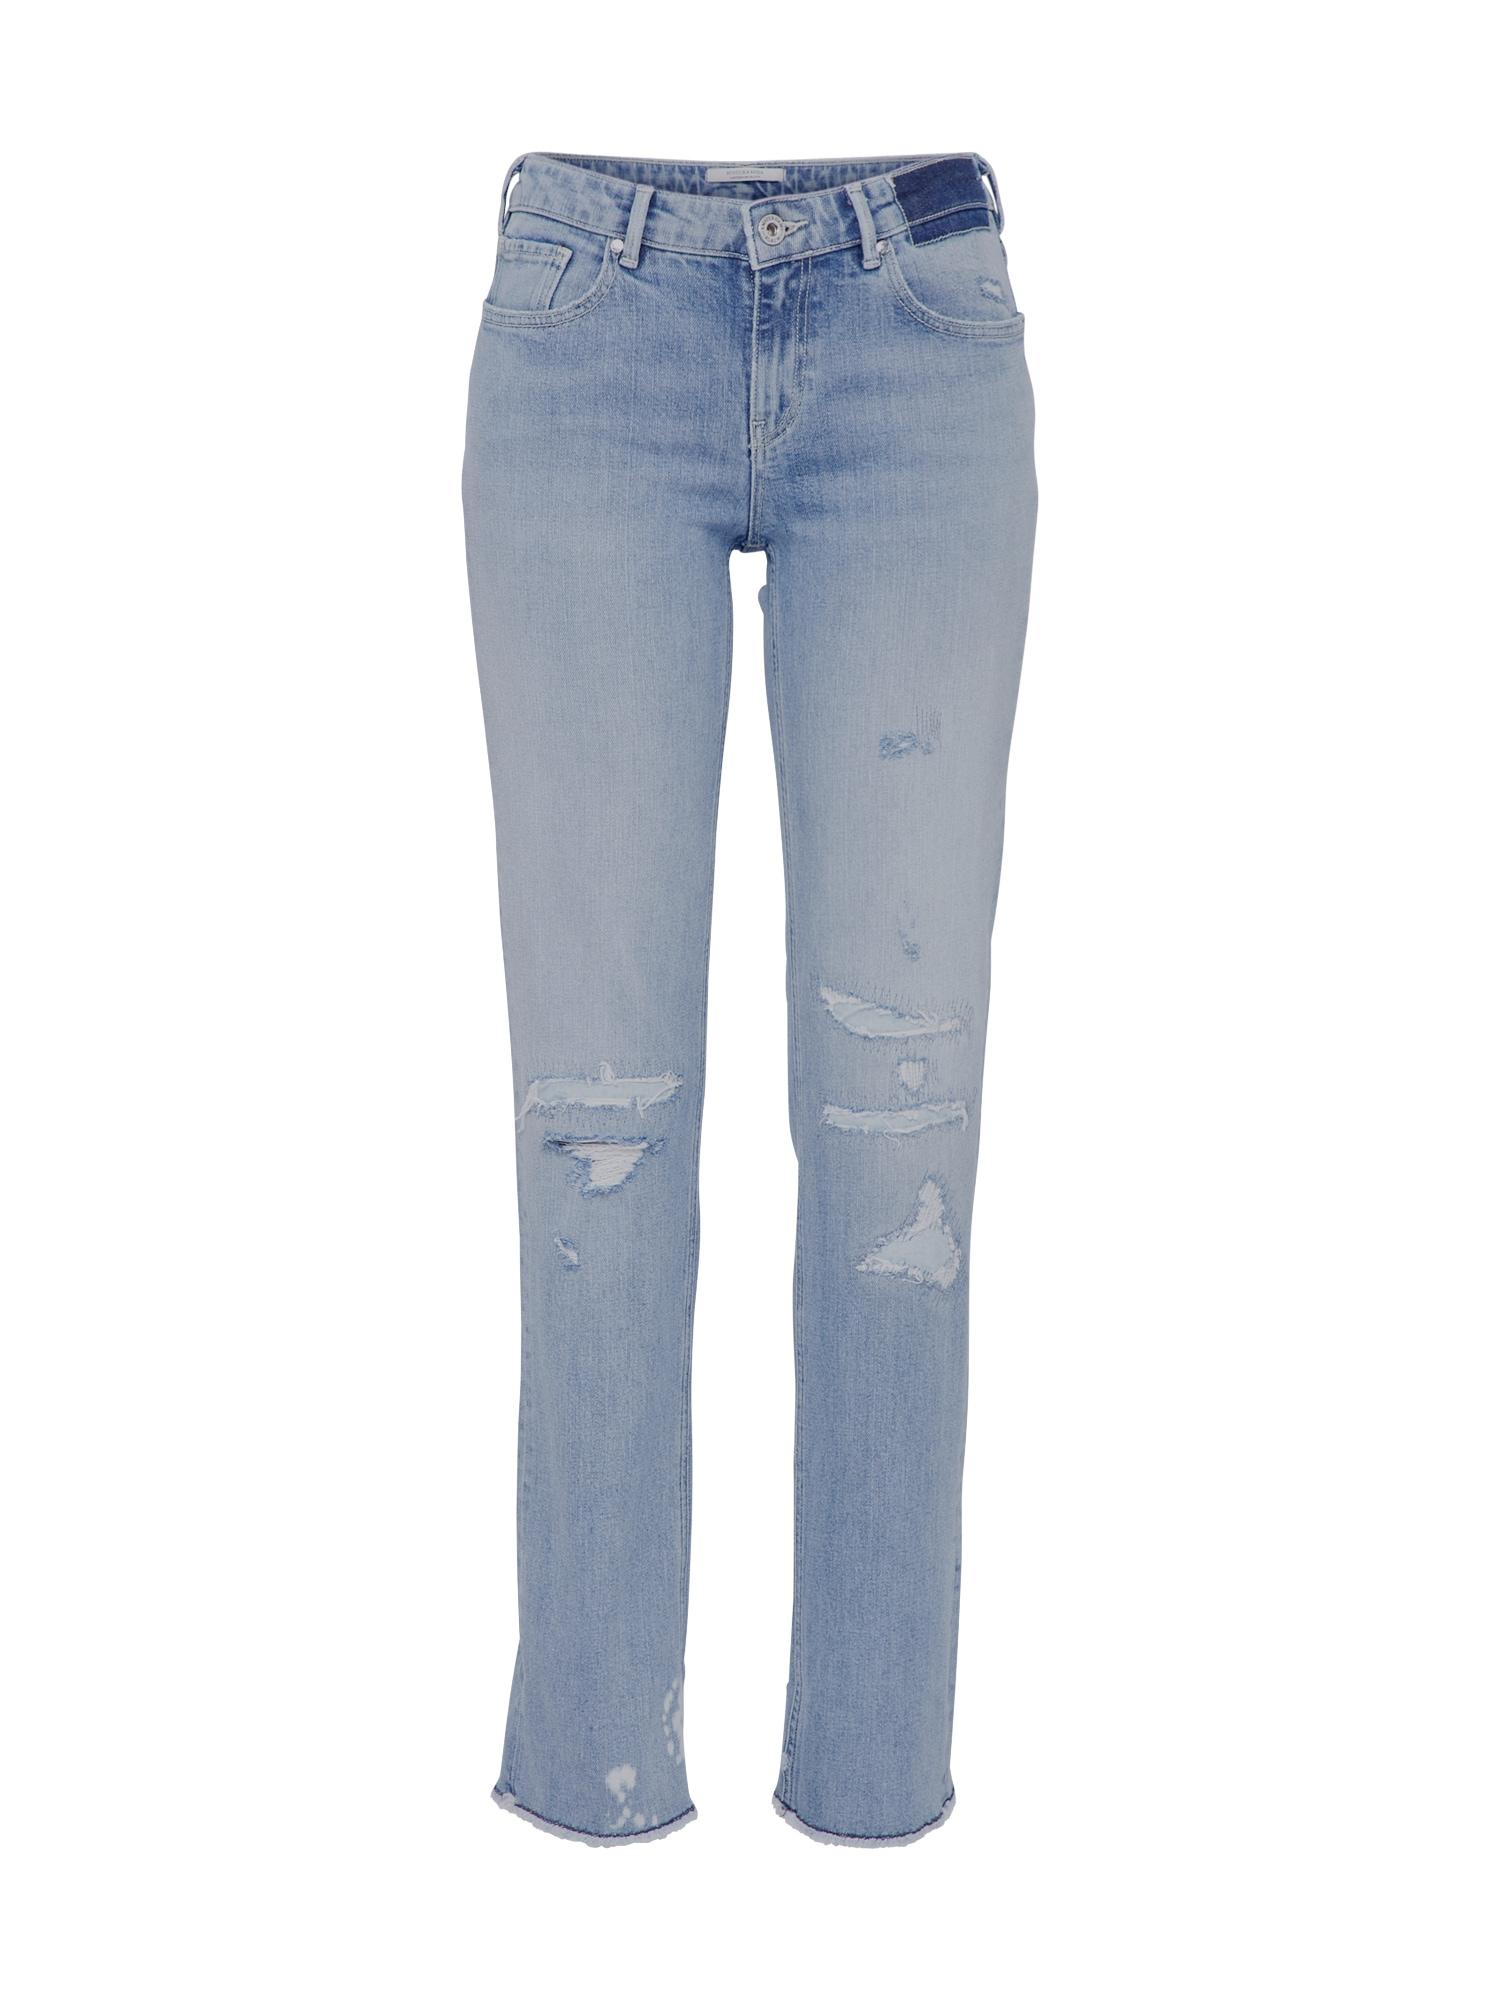 SCOTCH  and  SODA Dames Jeans Supreme blue denim